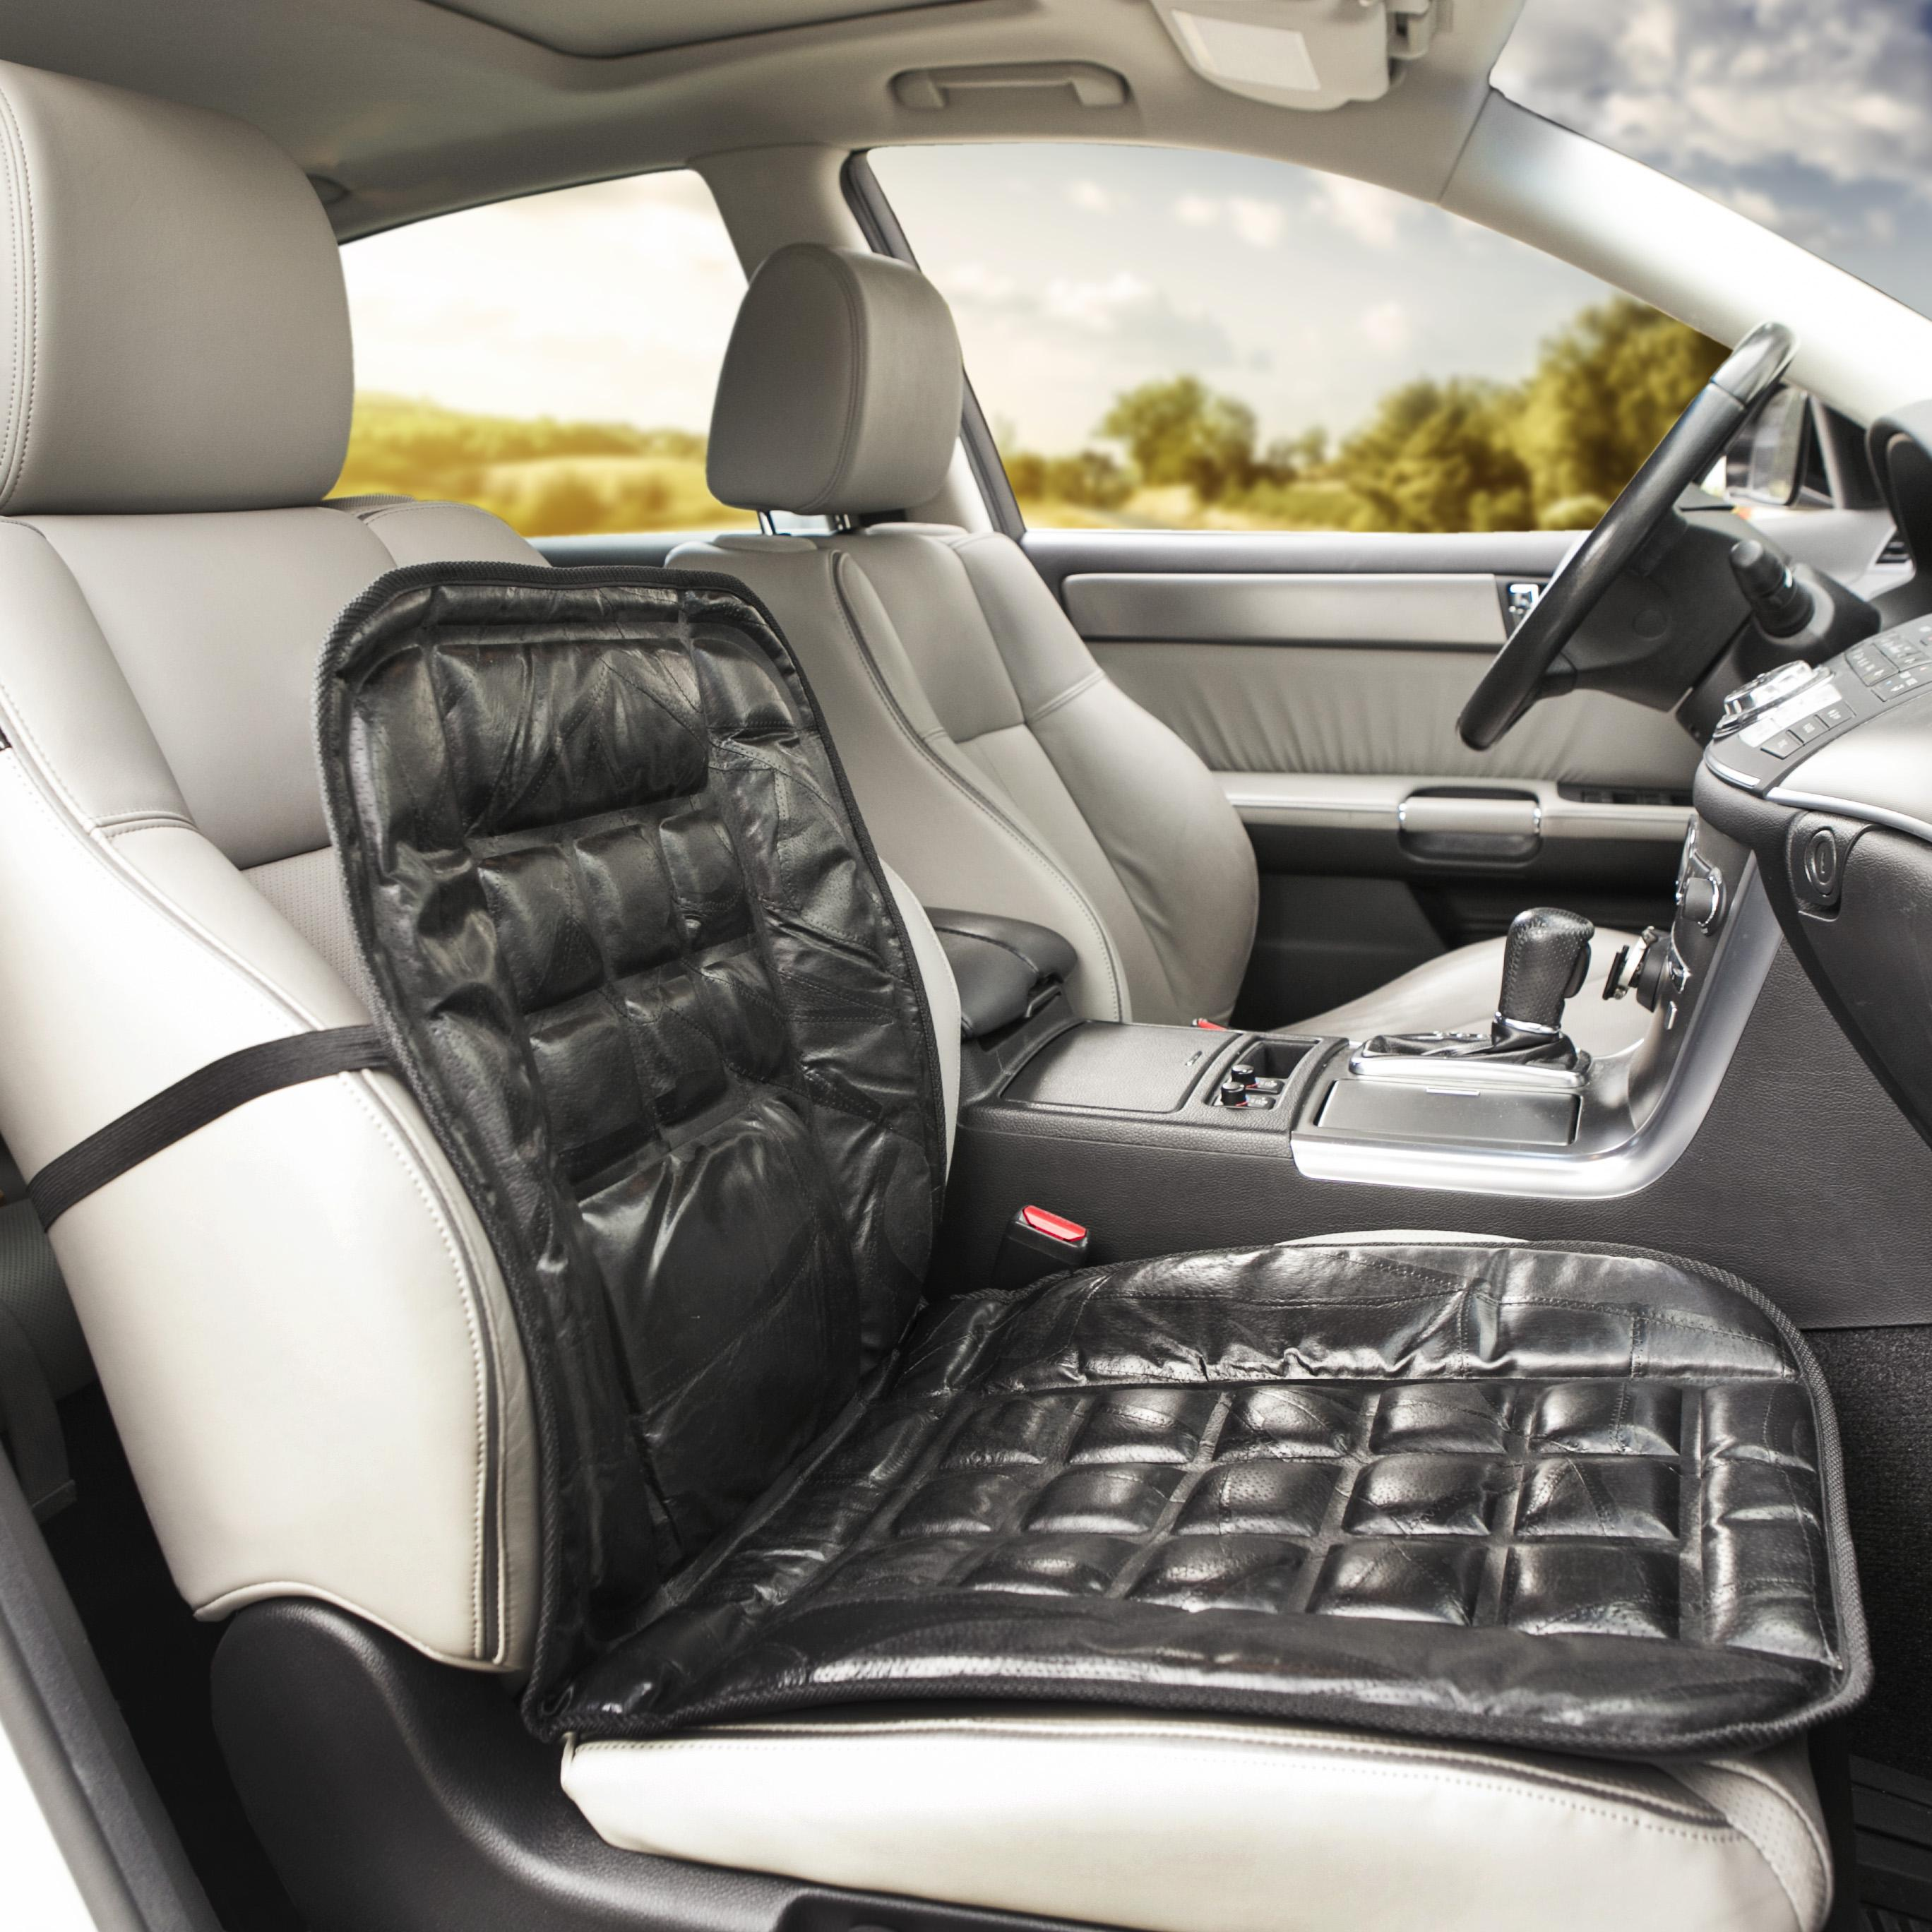 amazon com wagan in9615 leather lumbar support cushion automotive